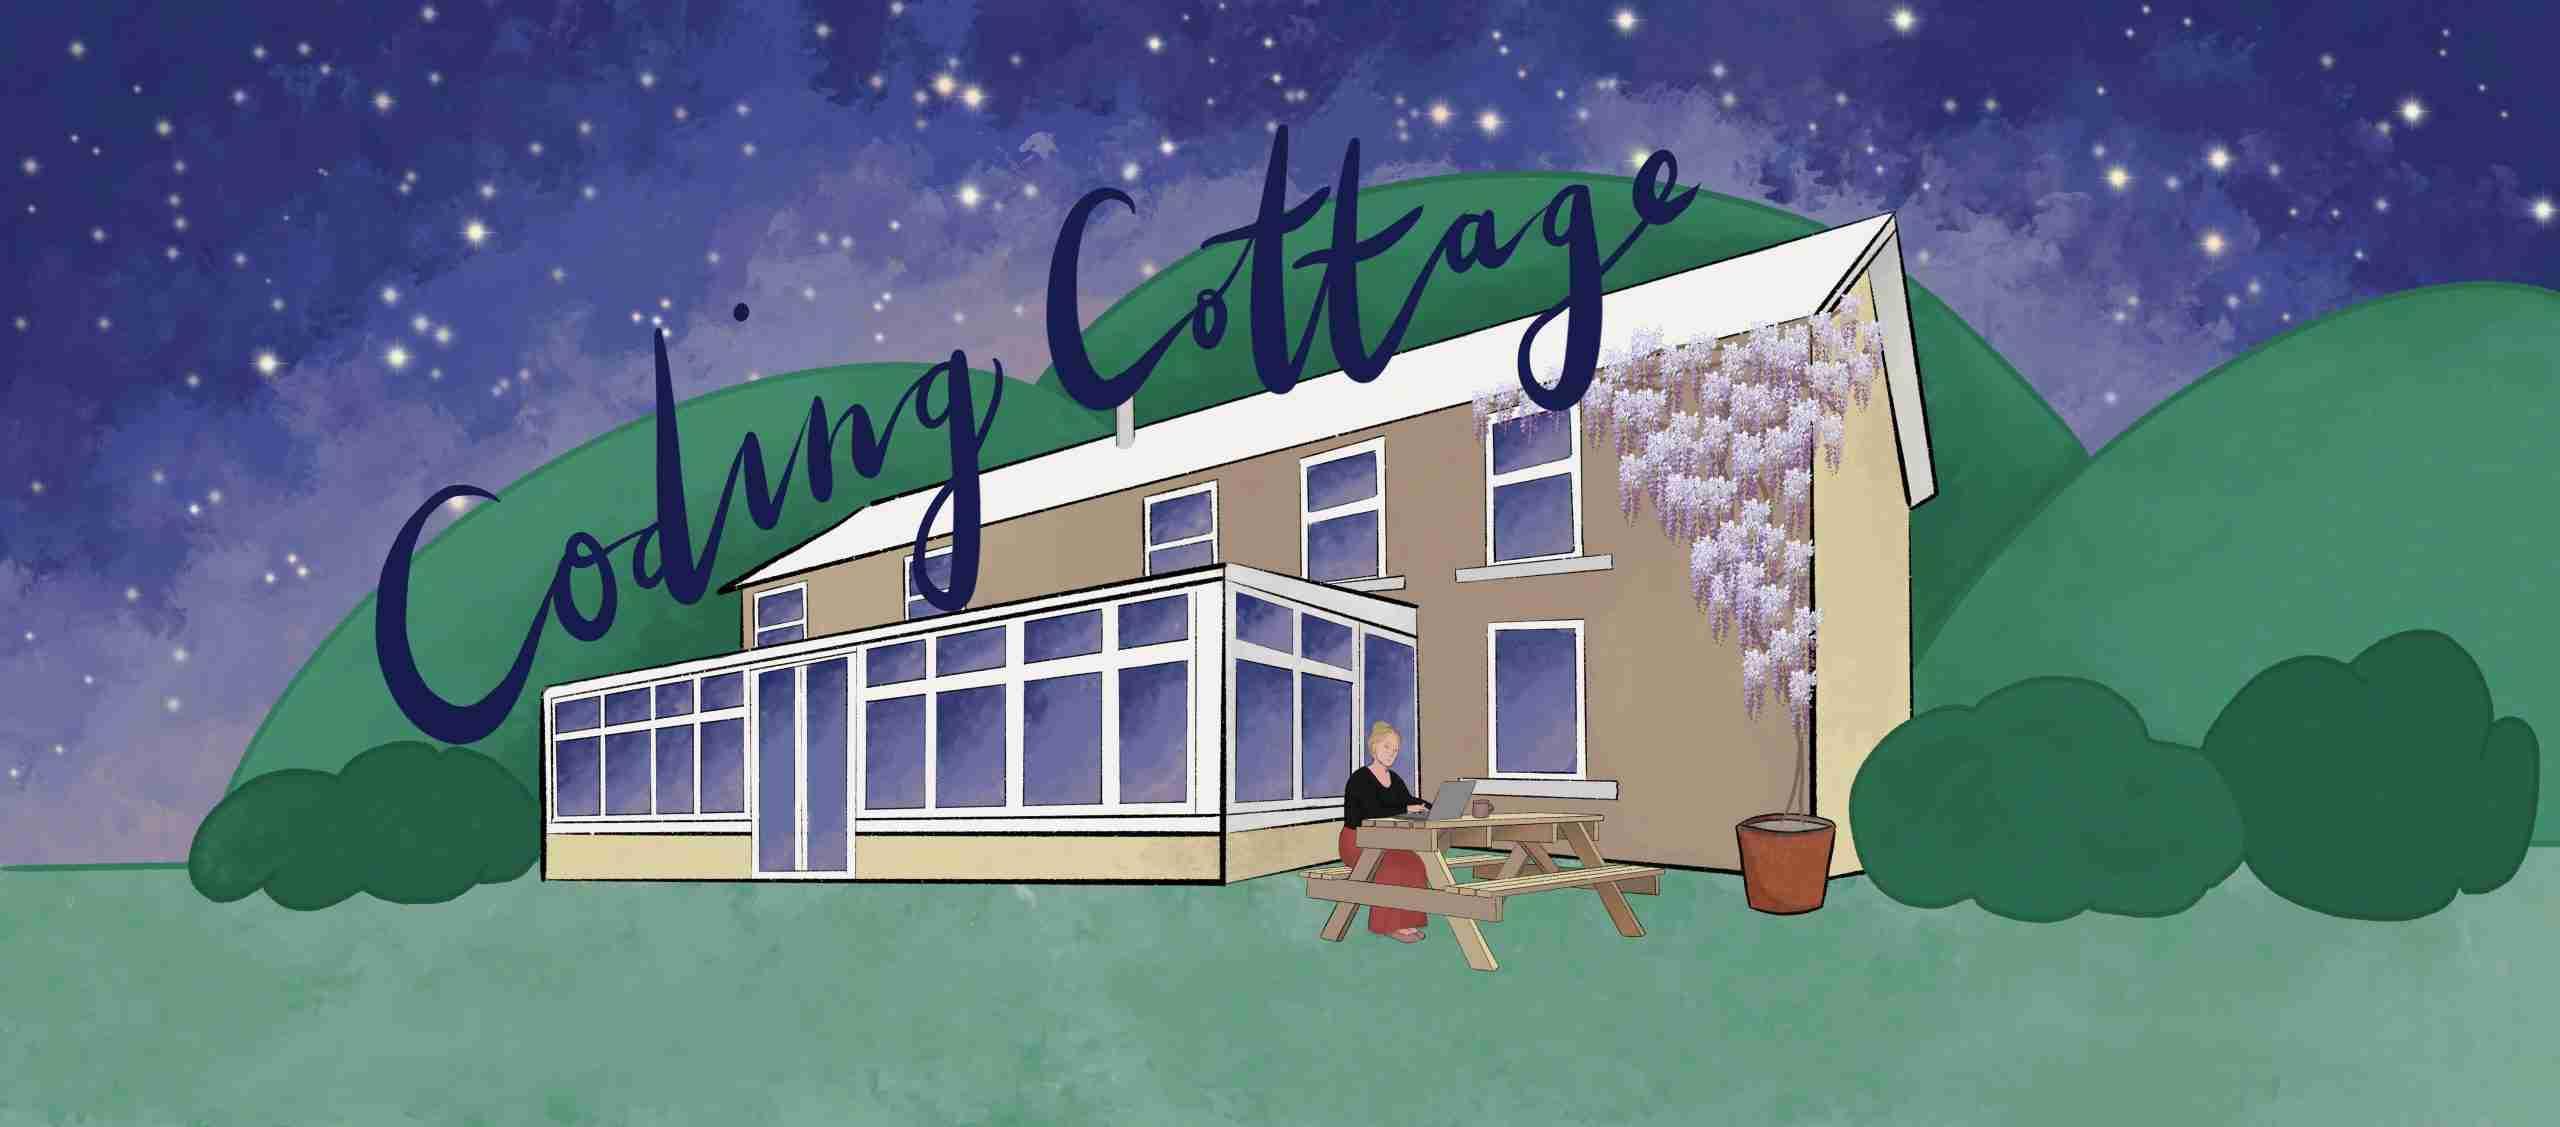 Coding Cottage Ltd